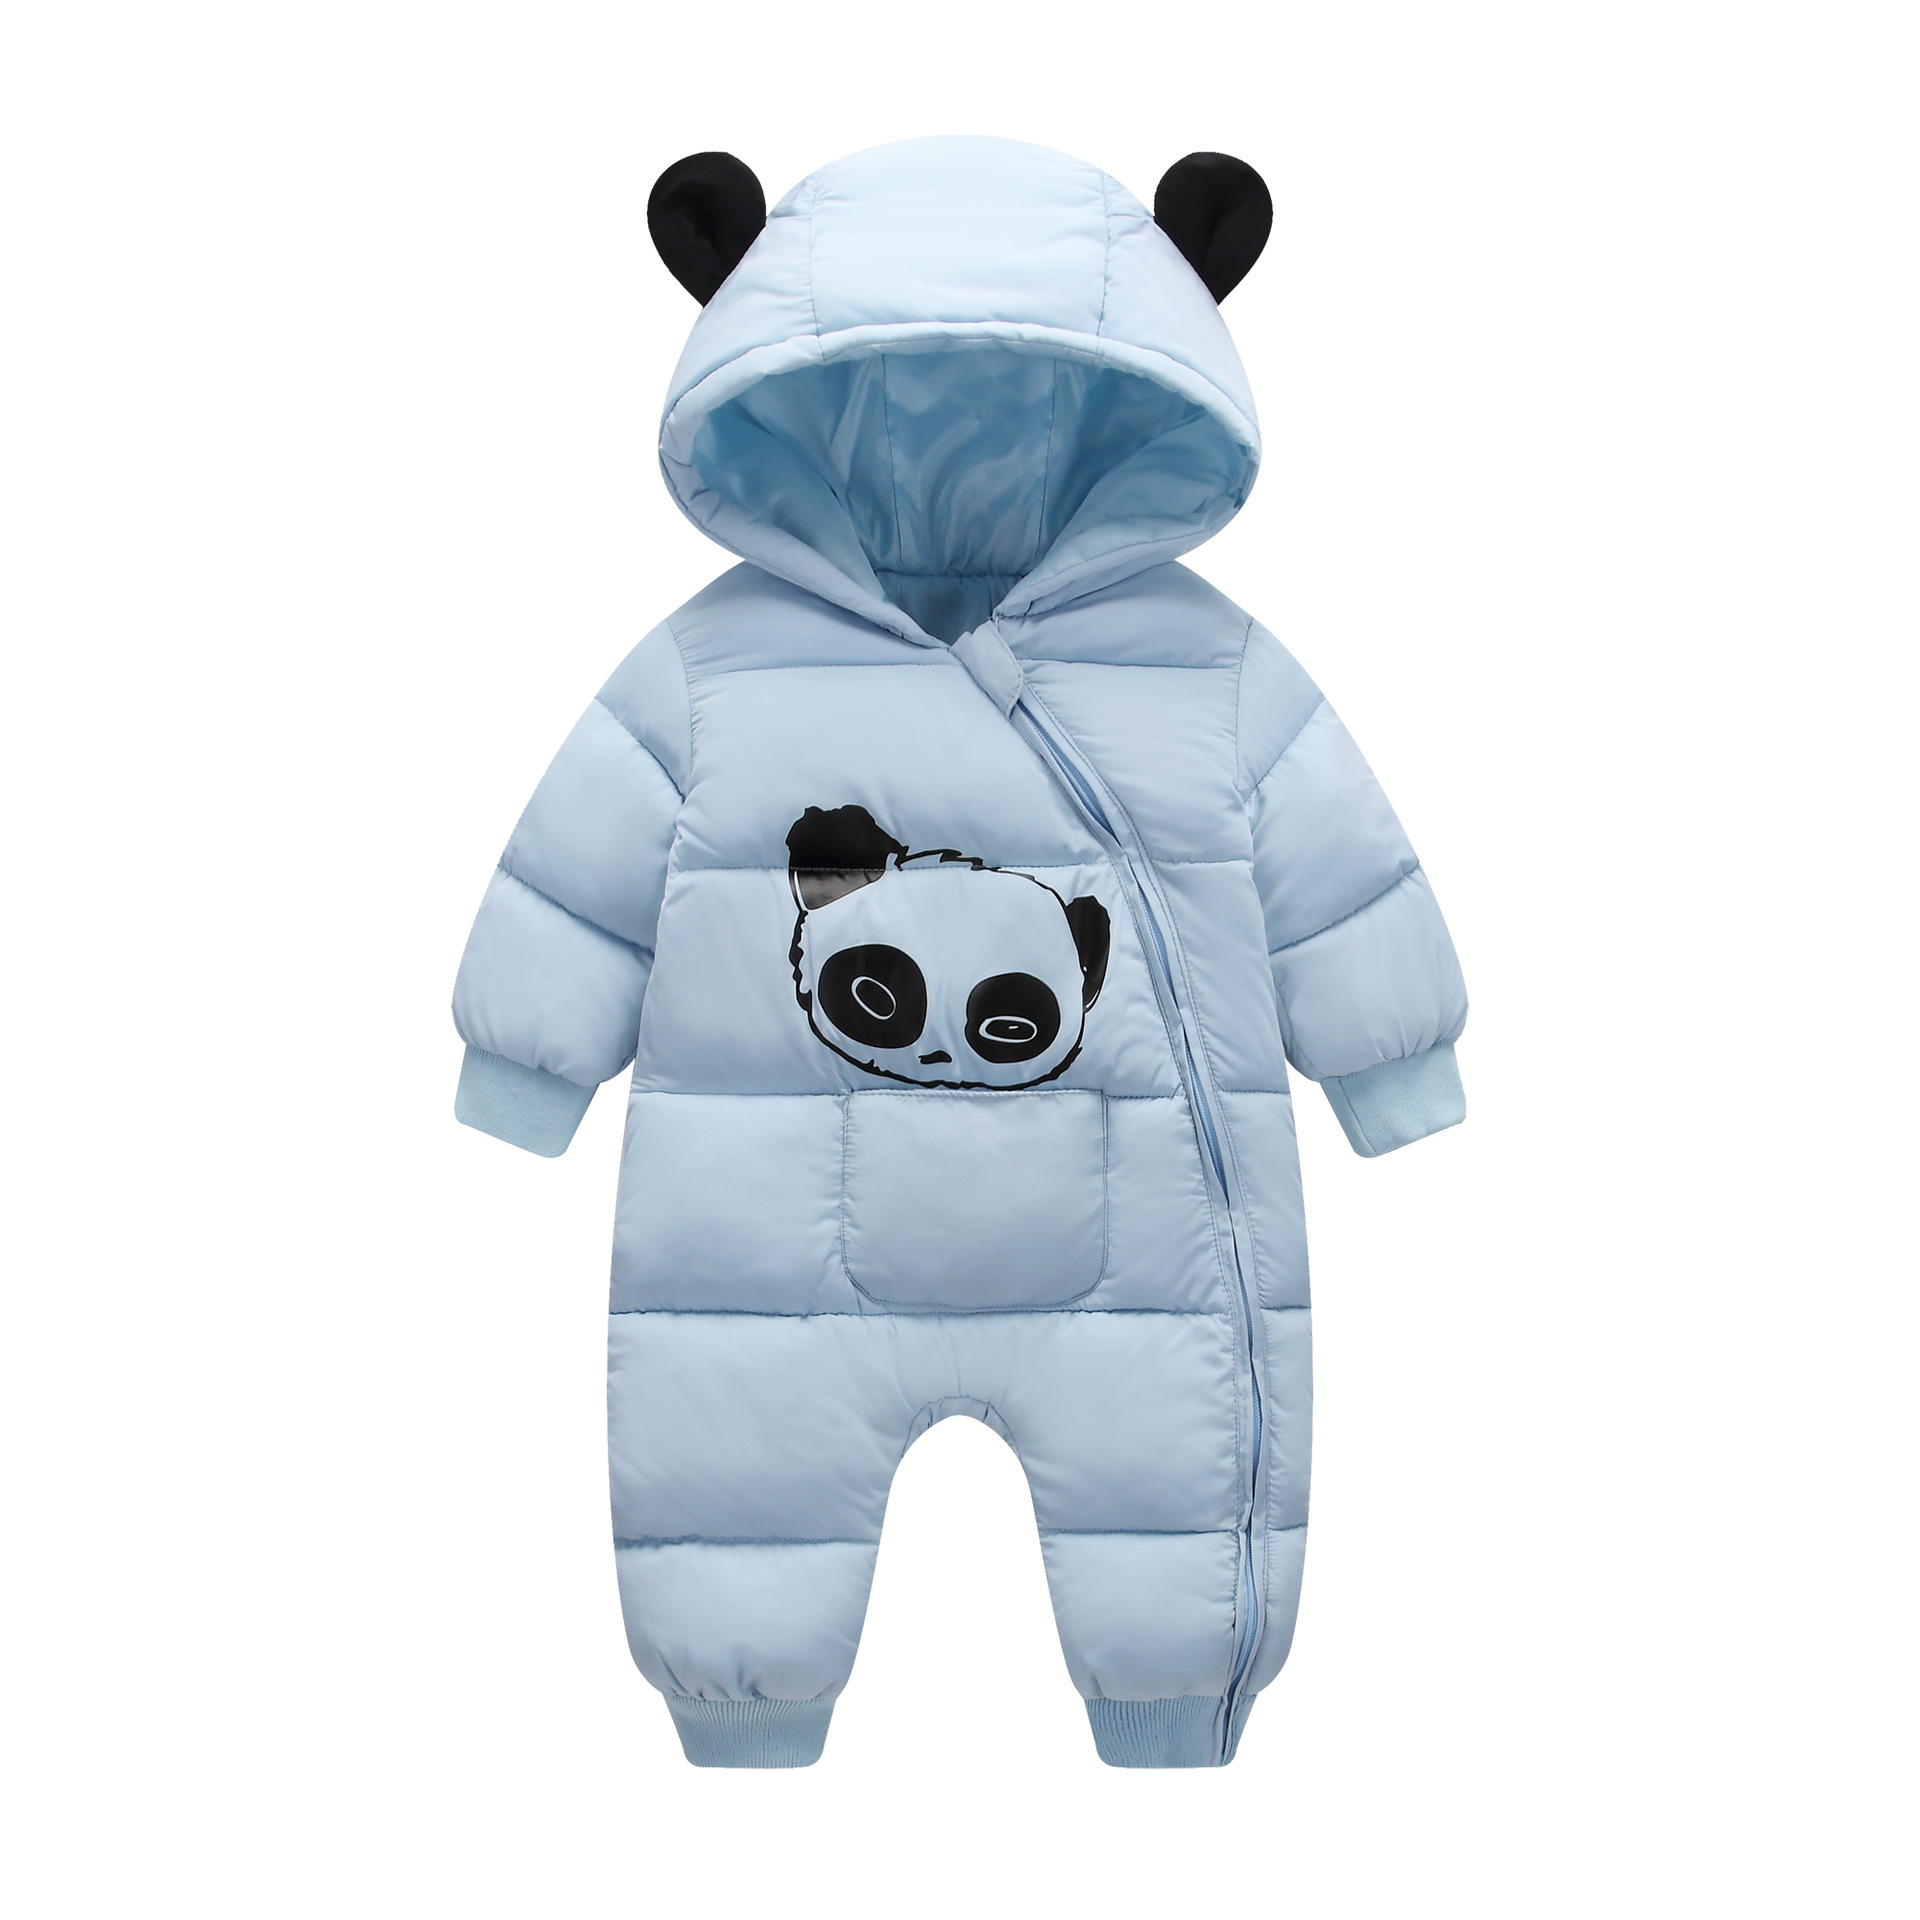 OLEKID 2021 Winter Baby Snowsuit Cartoon panda Thick Warm Newborn Baby Girl Jumpsuit Toddler Snow Suit Baby Boy Rompers Overalls